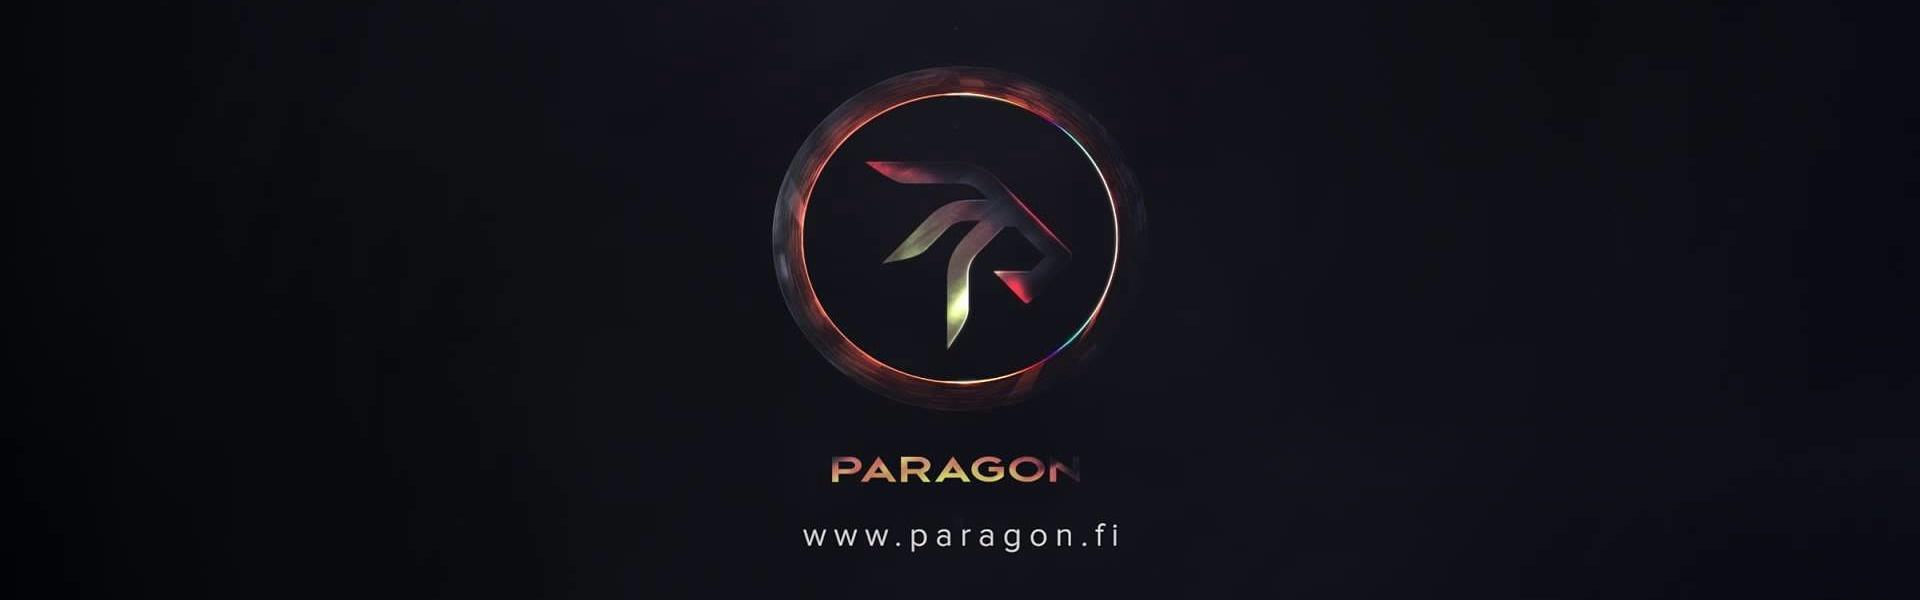 paragon-banniere